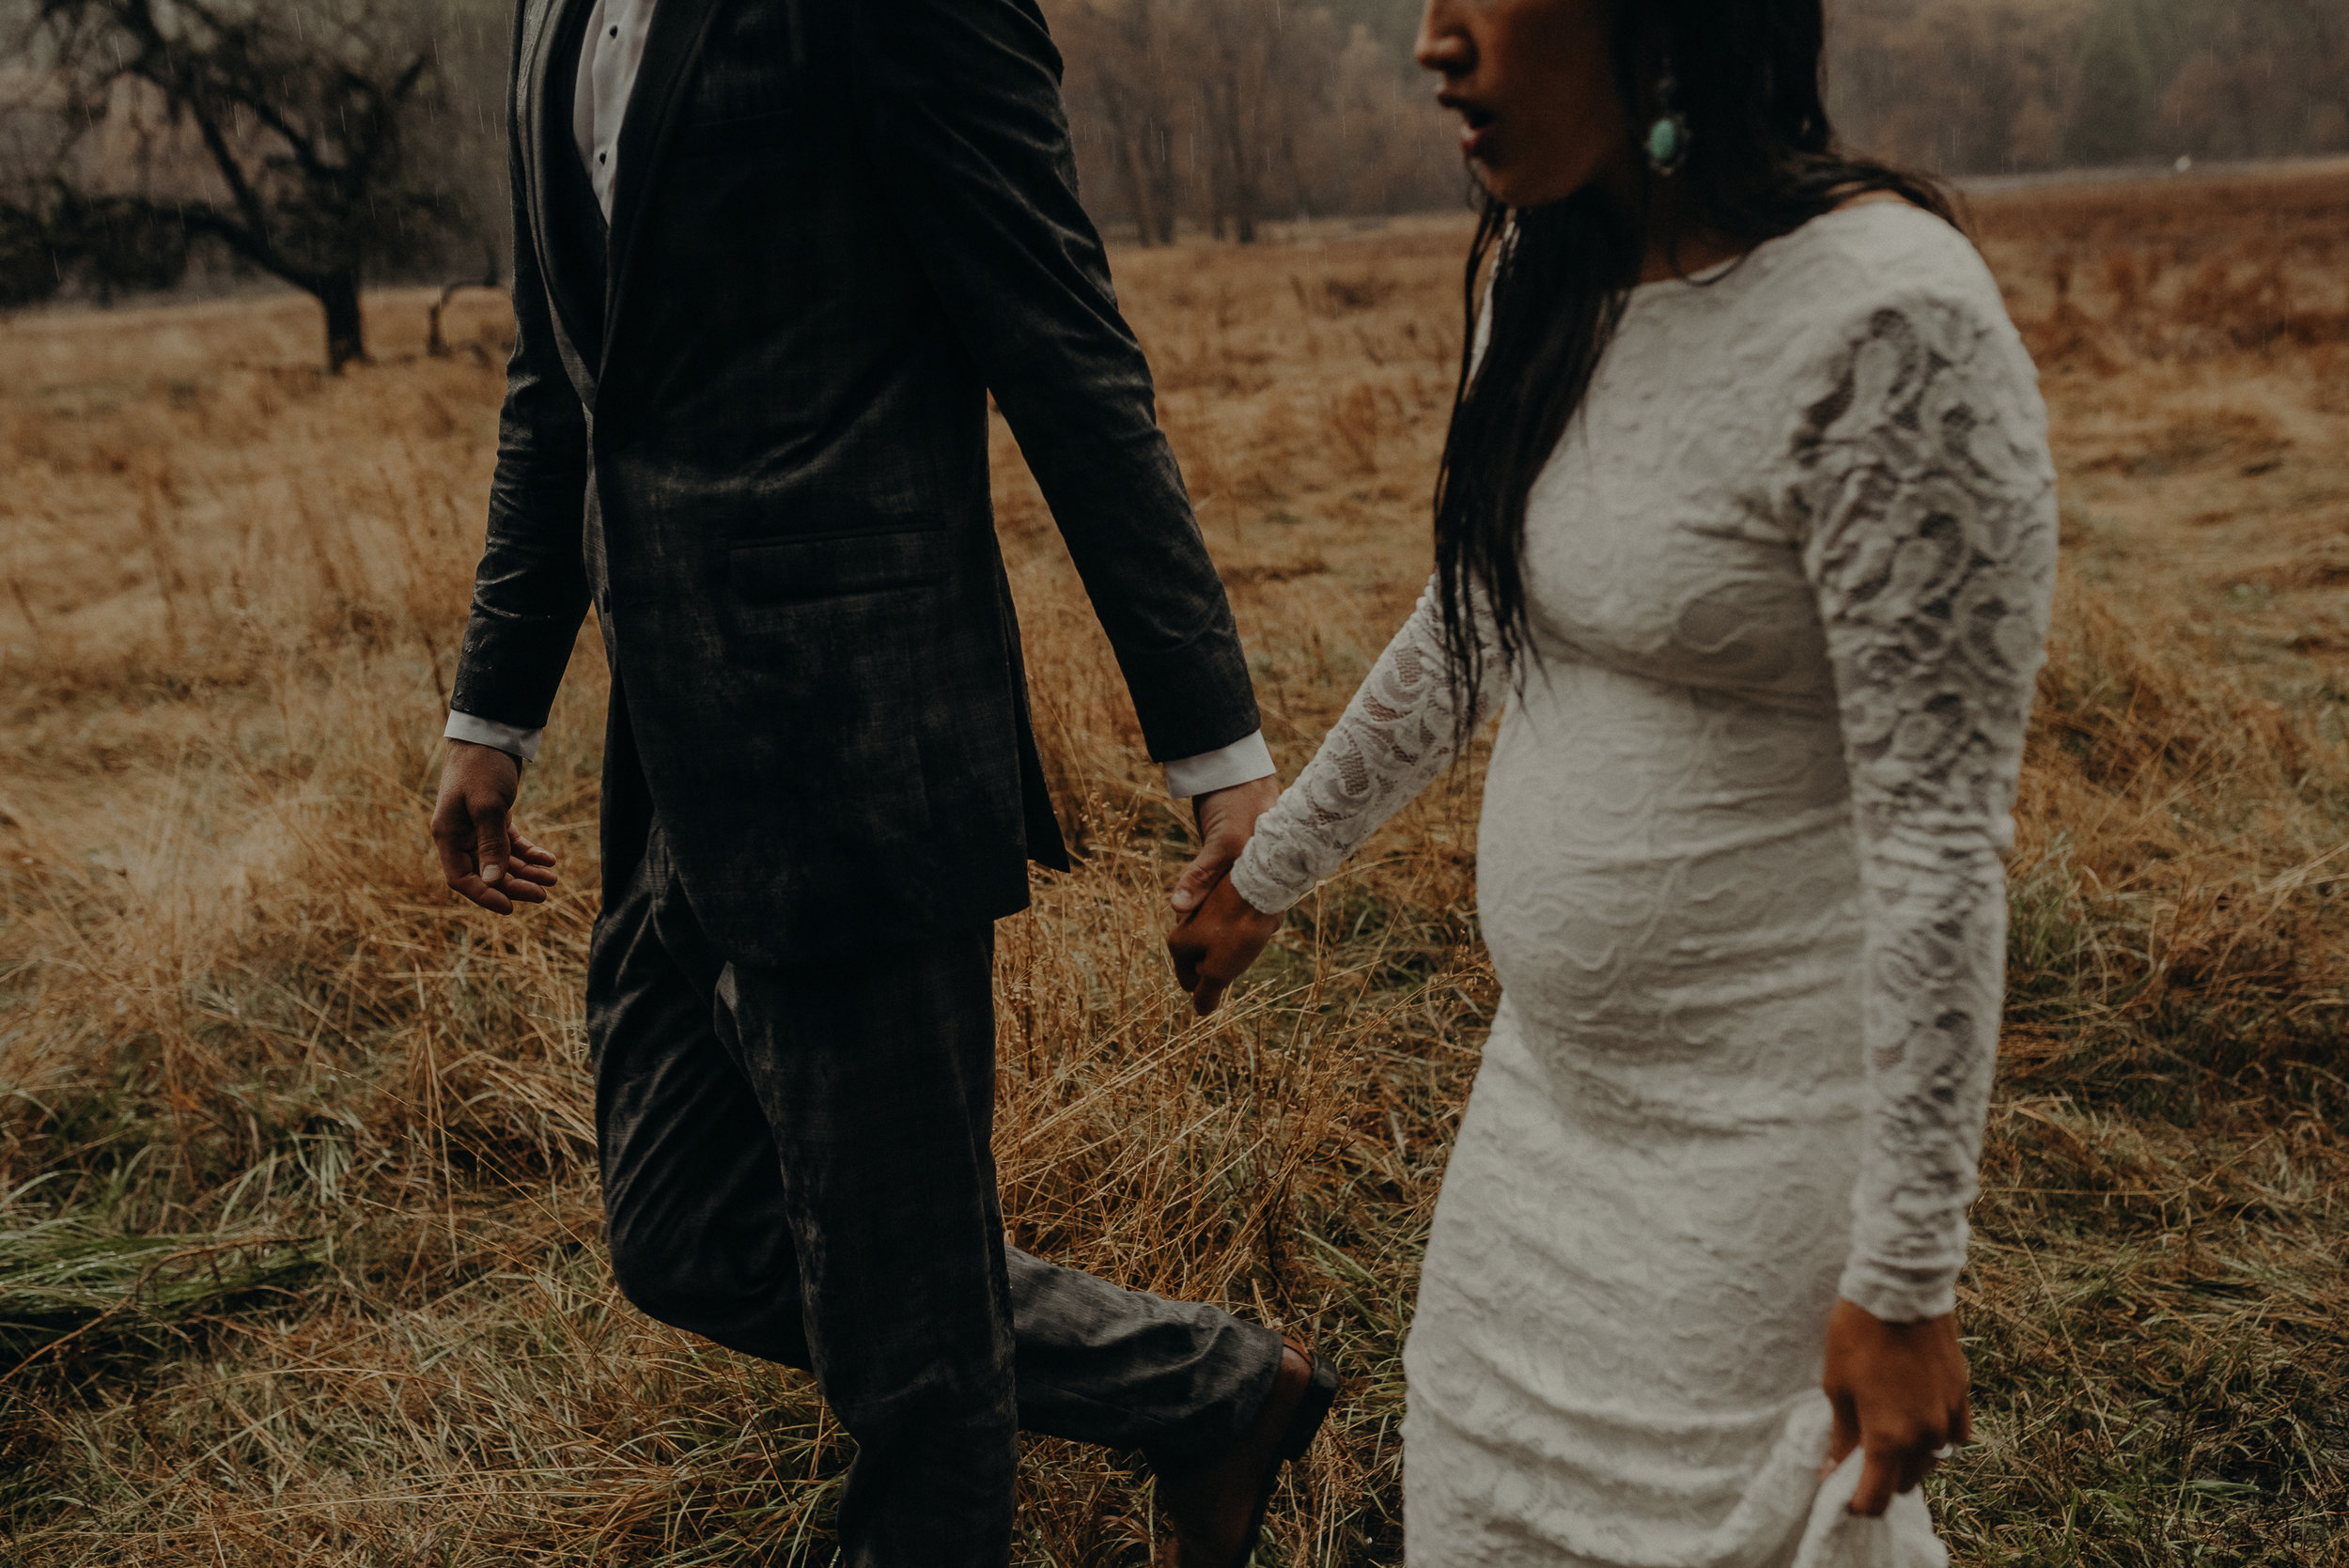 Isaiah + Taylor Photography - Yosemite Elopement - Los Angeles Wedding Photographer-72.jpg